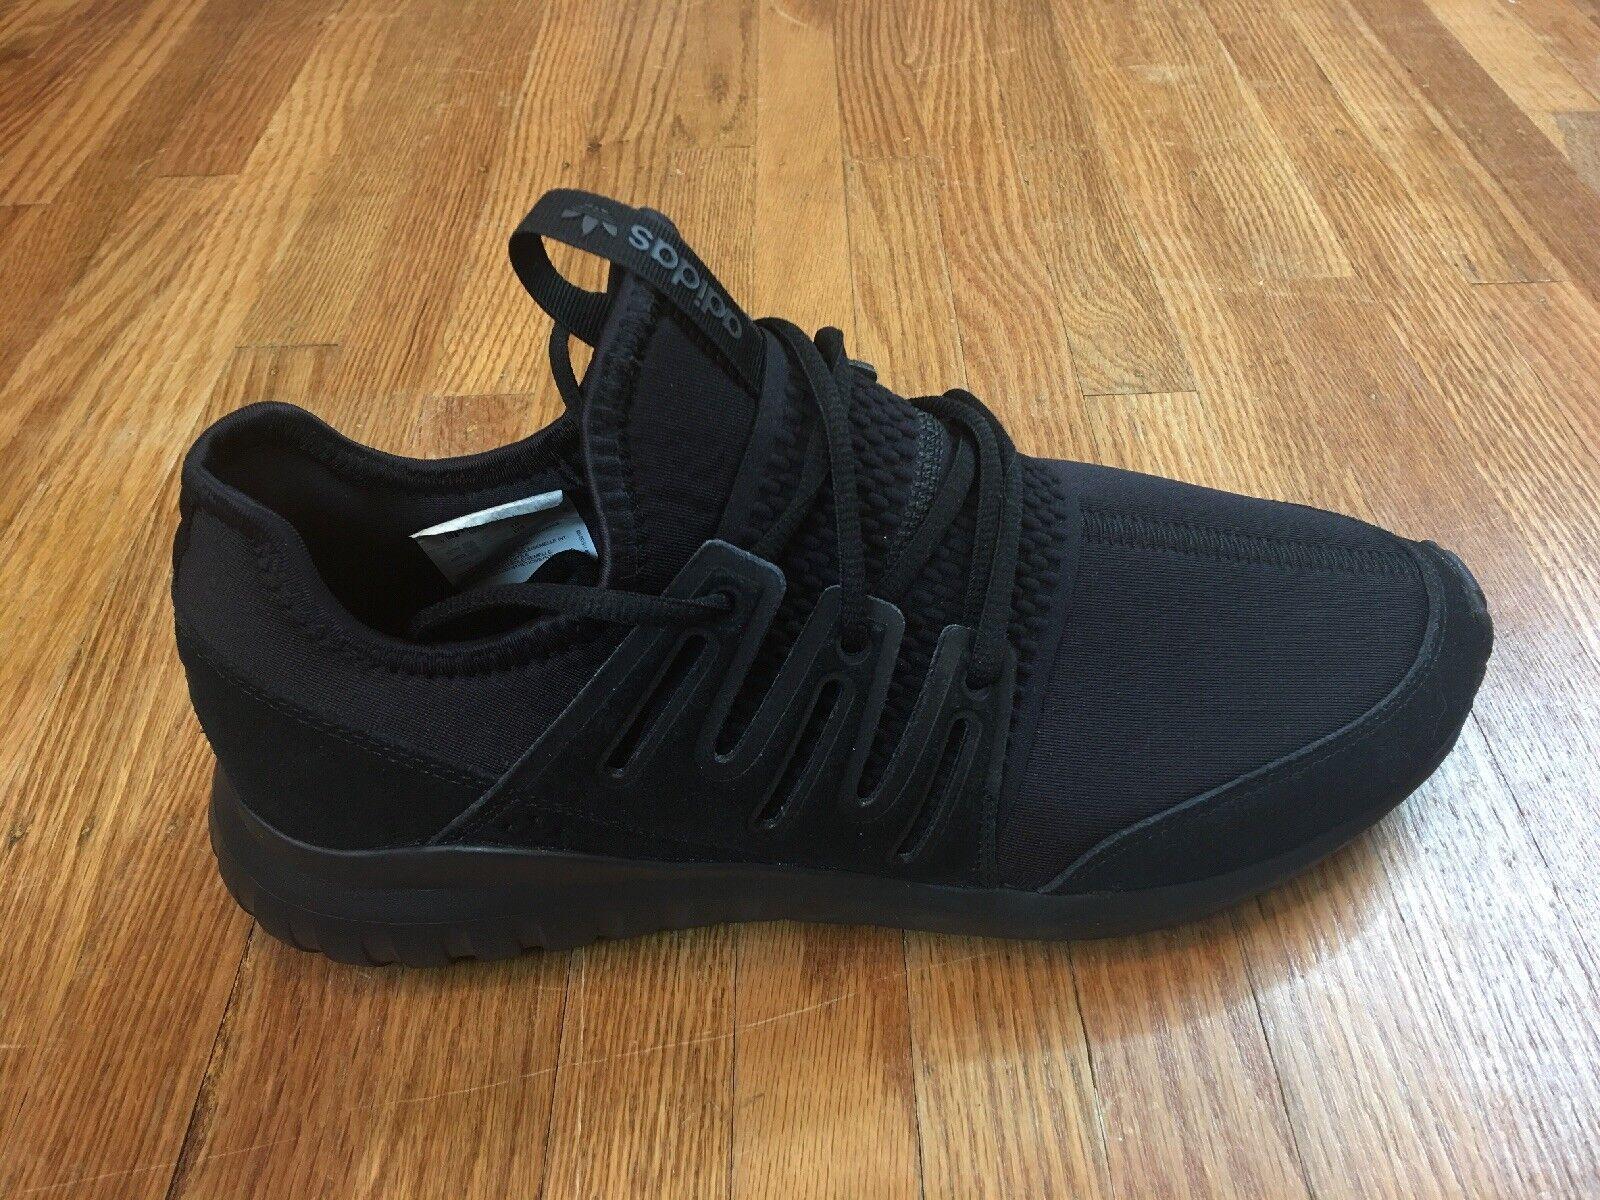 Adidas Mens Tubular Radical shoes Sz 10 Triple Black Running Trainer Sneakers